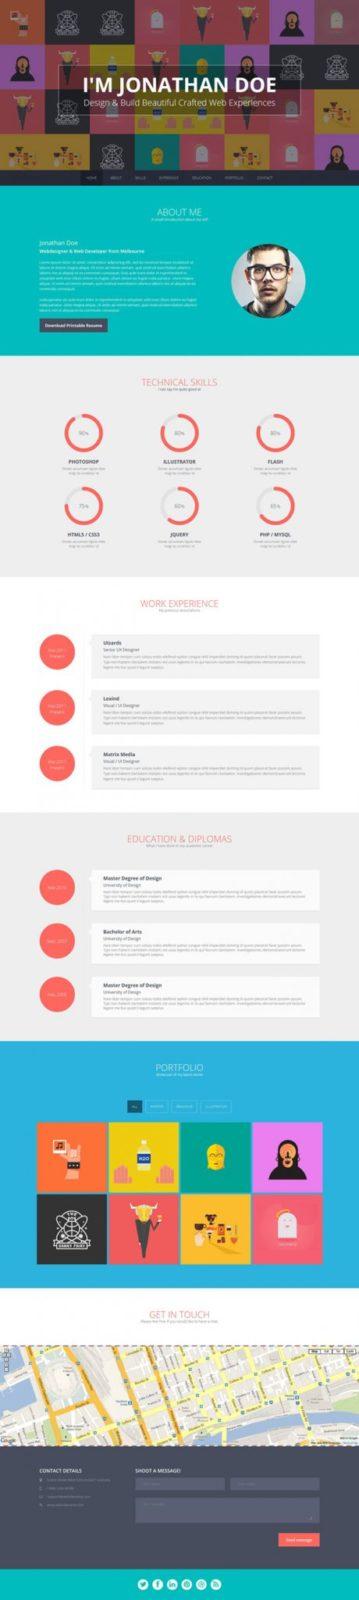 Flato – Responsive Online Flat CV & Resume Templates